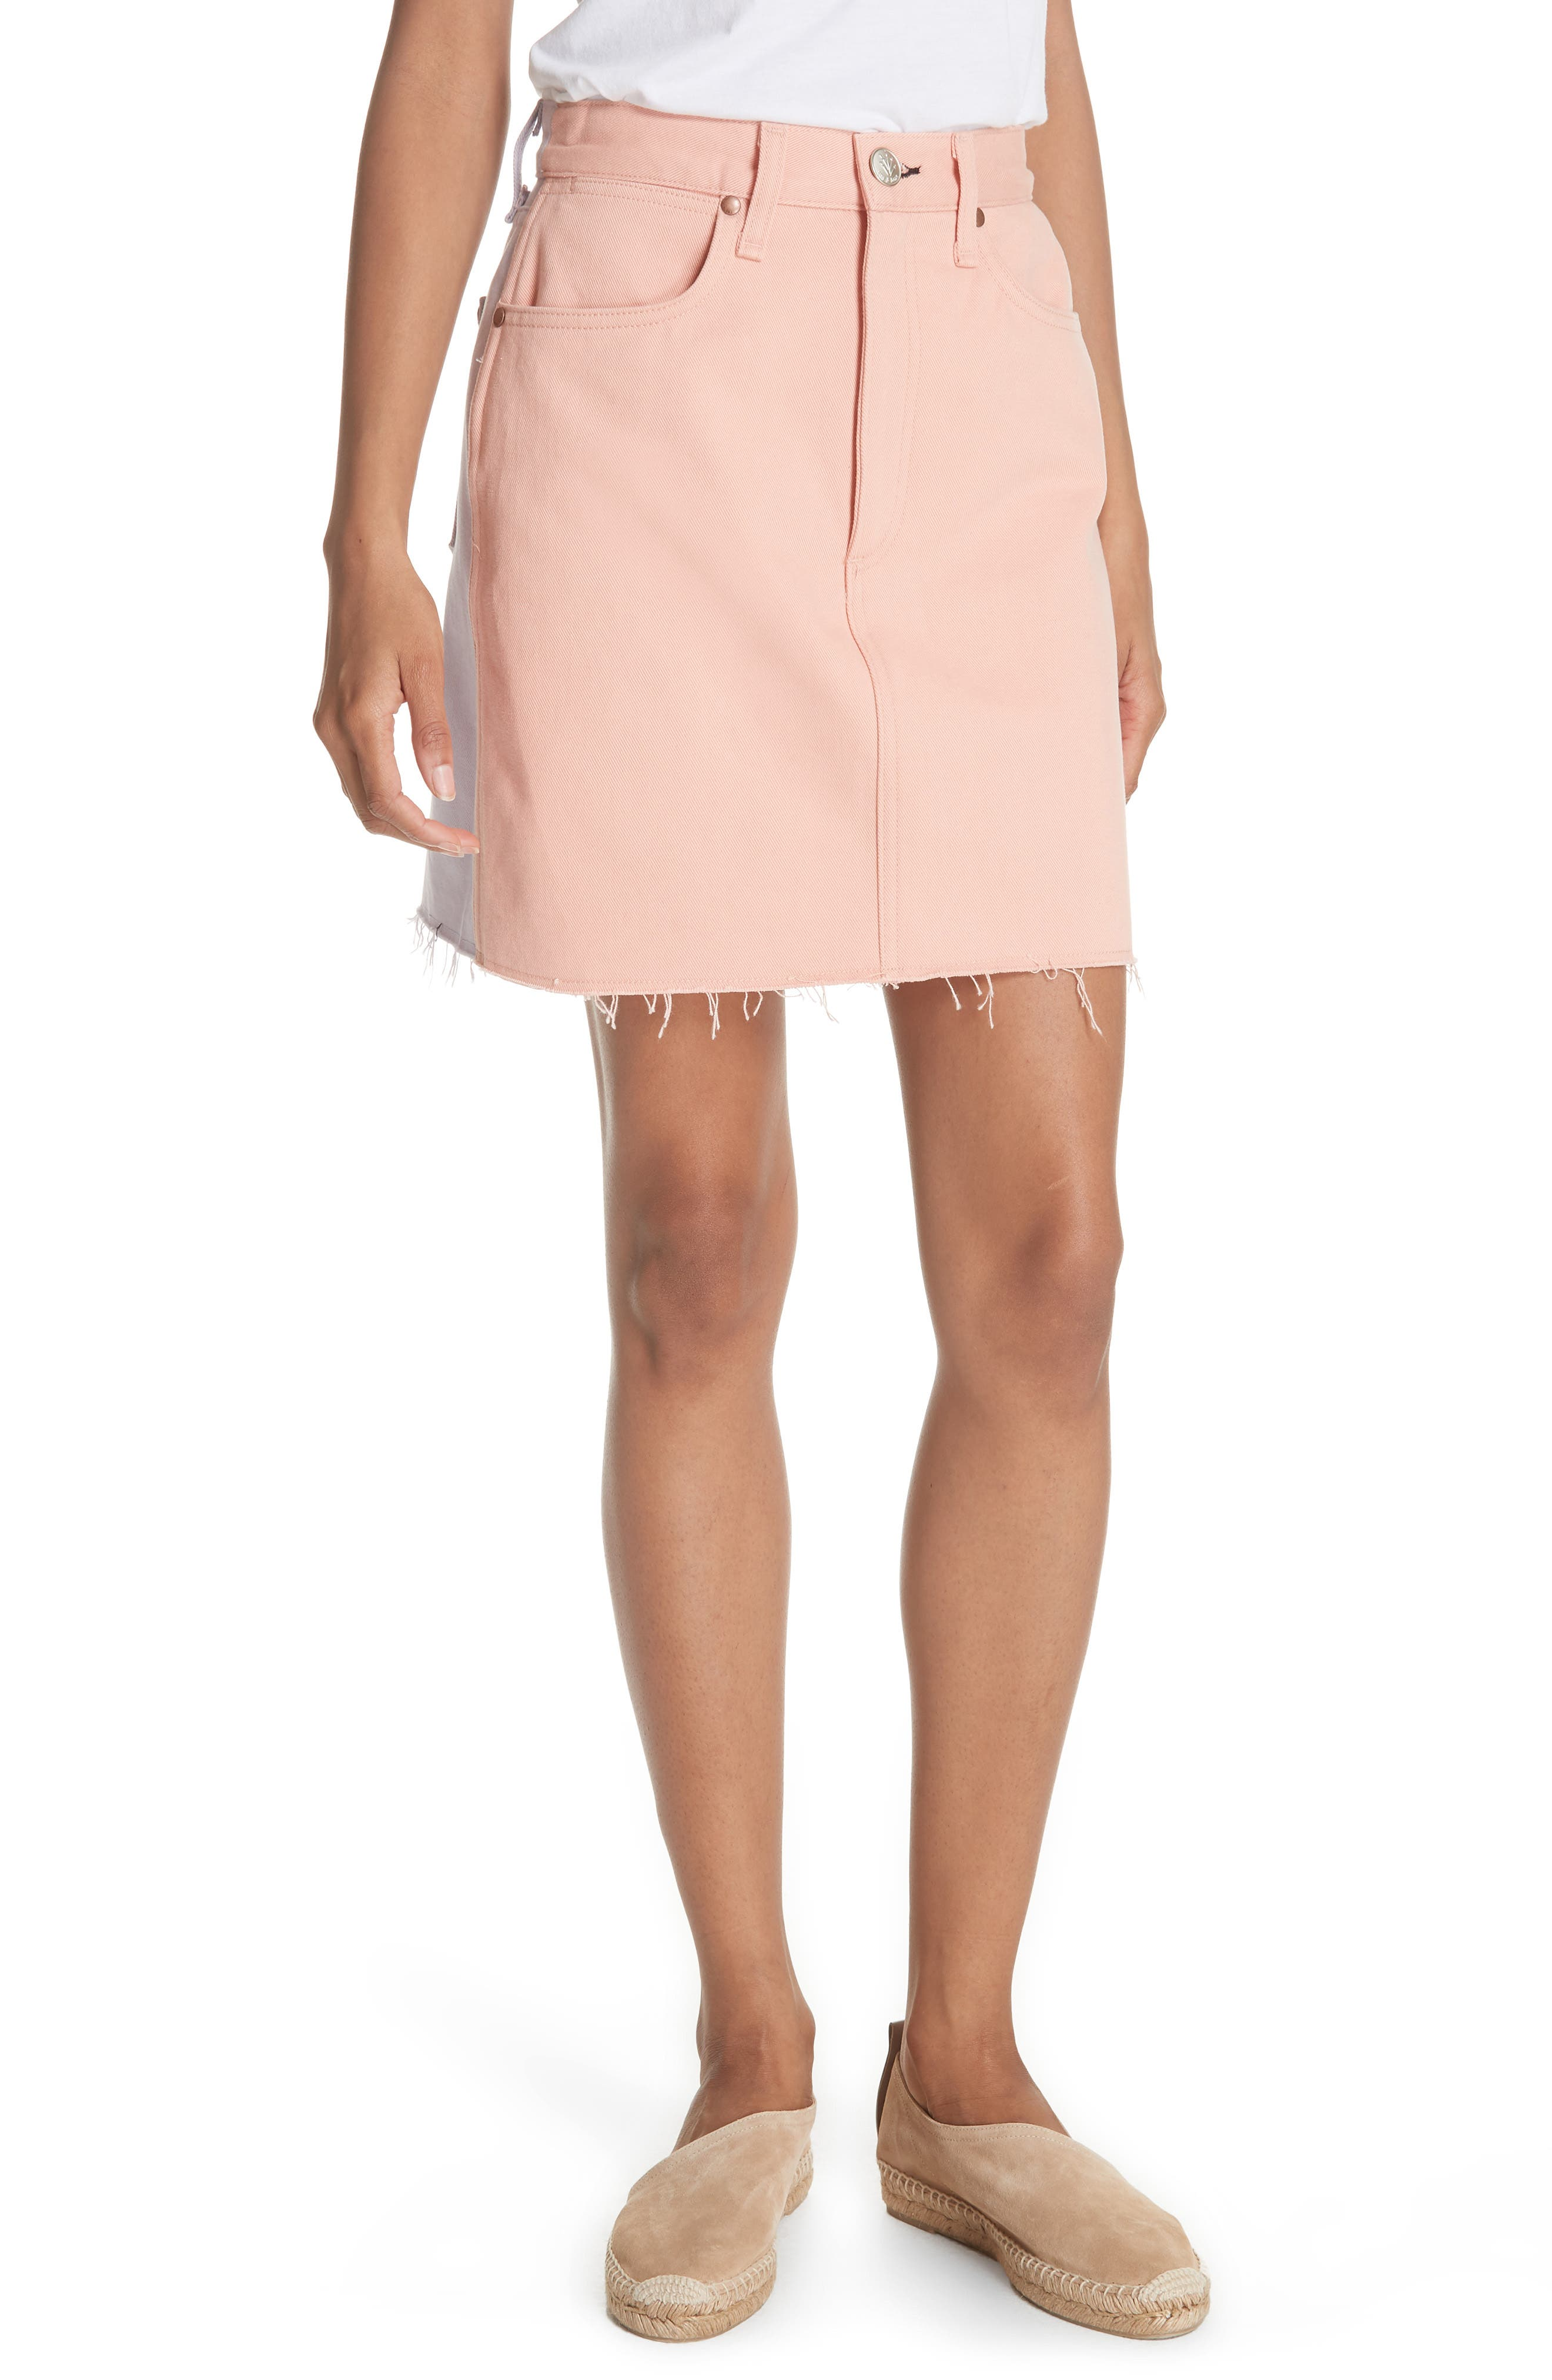 Moss Skirt,                         Main,                         color, 950